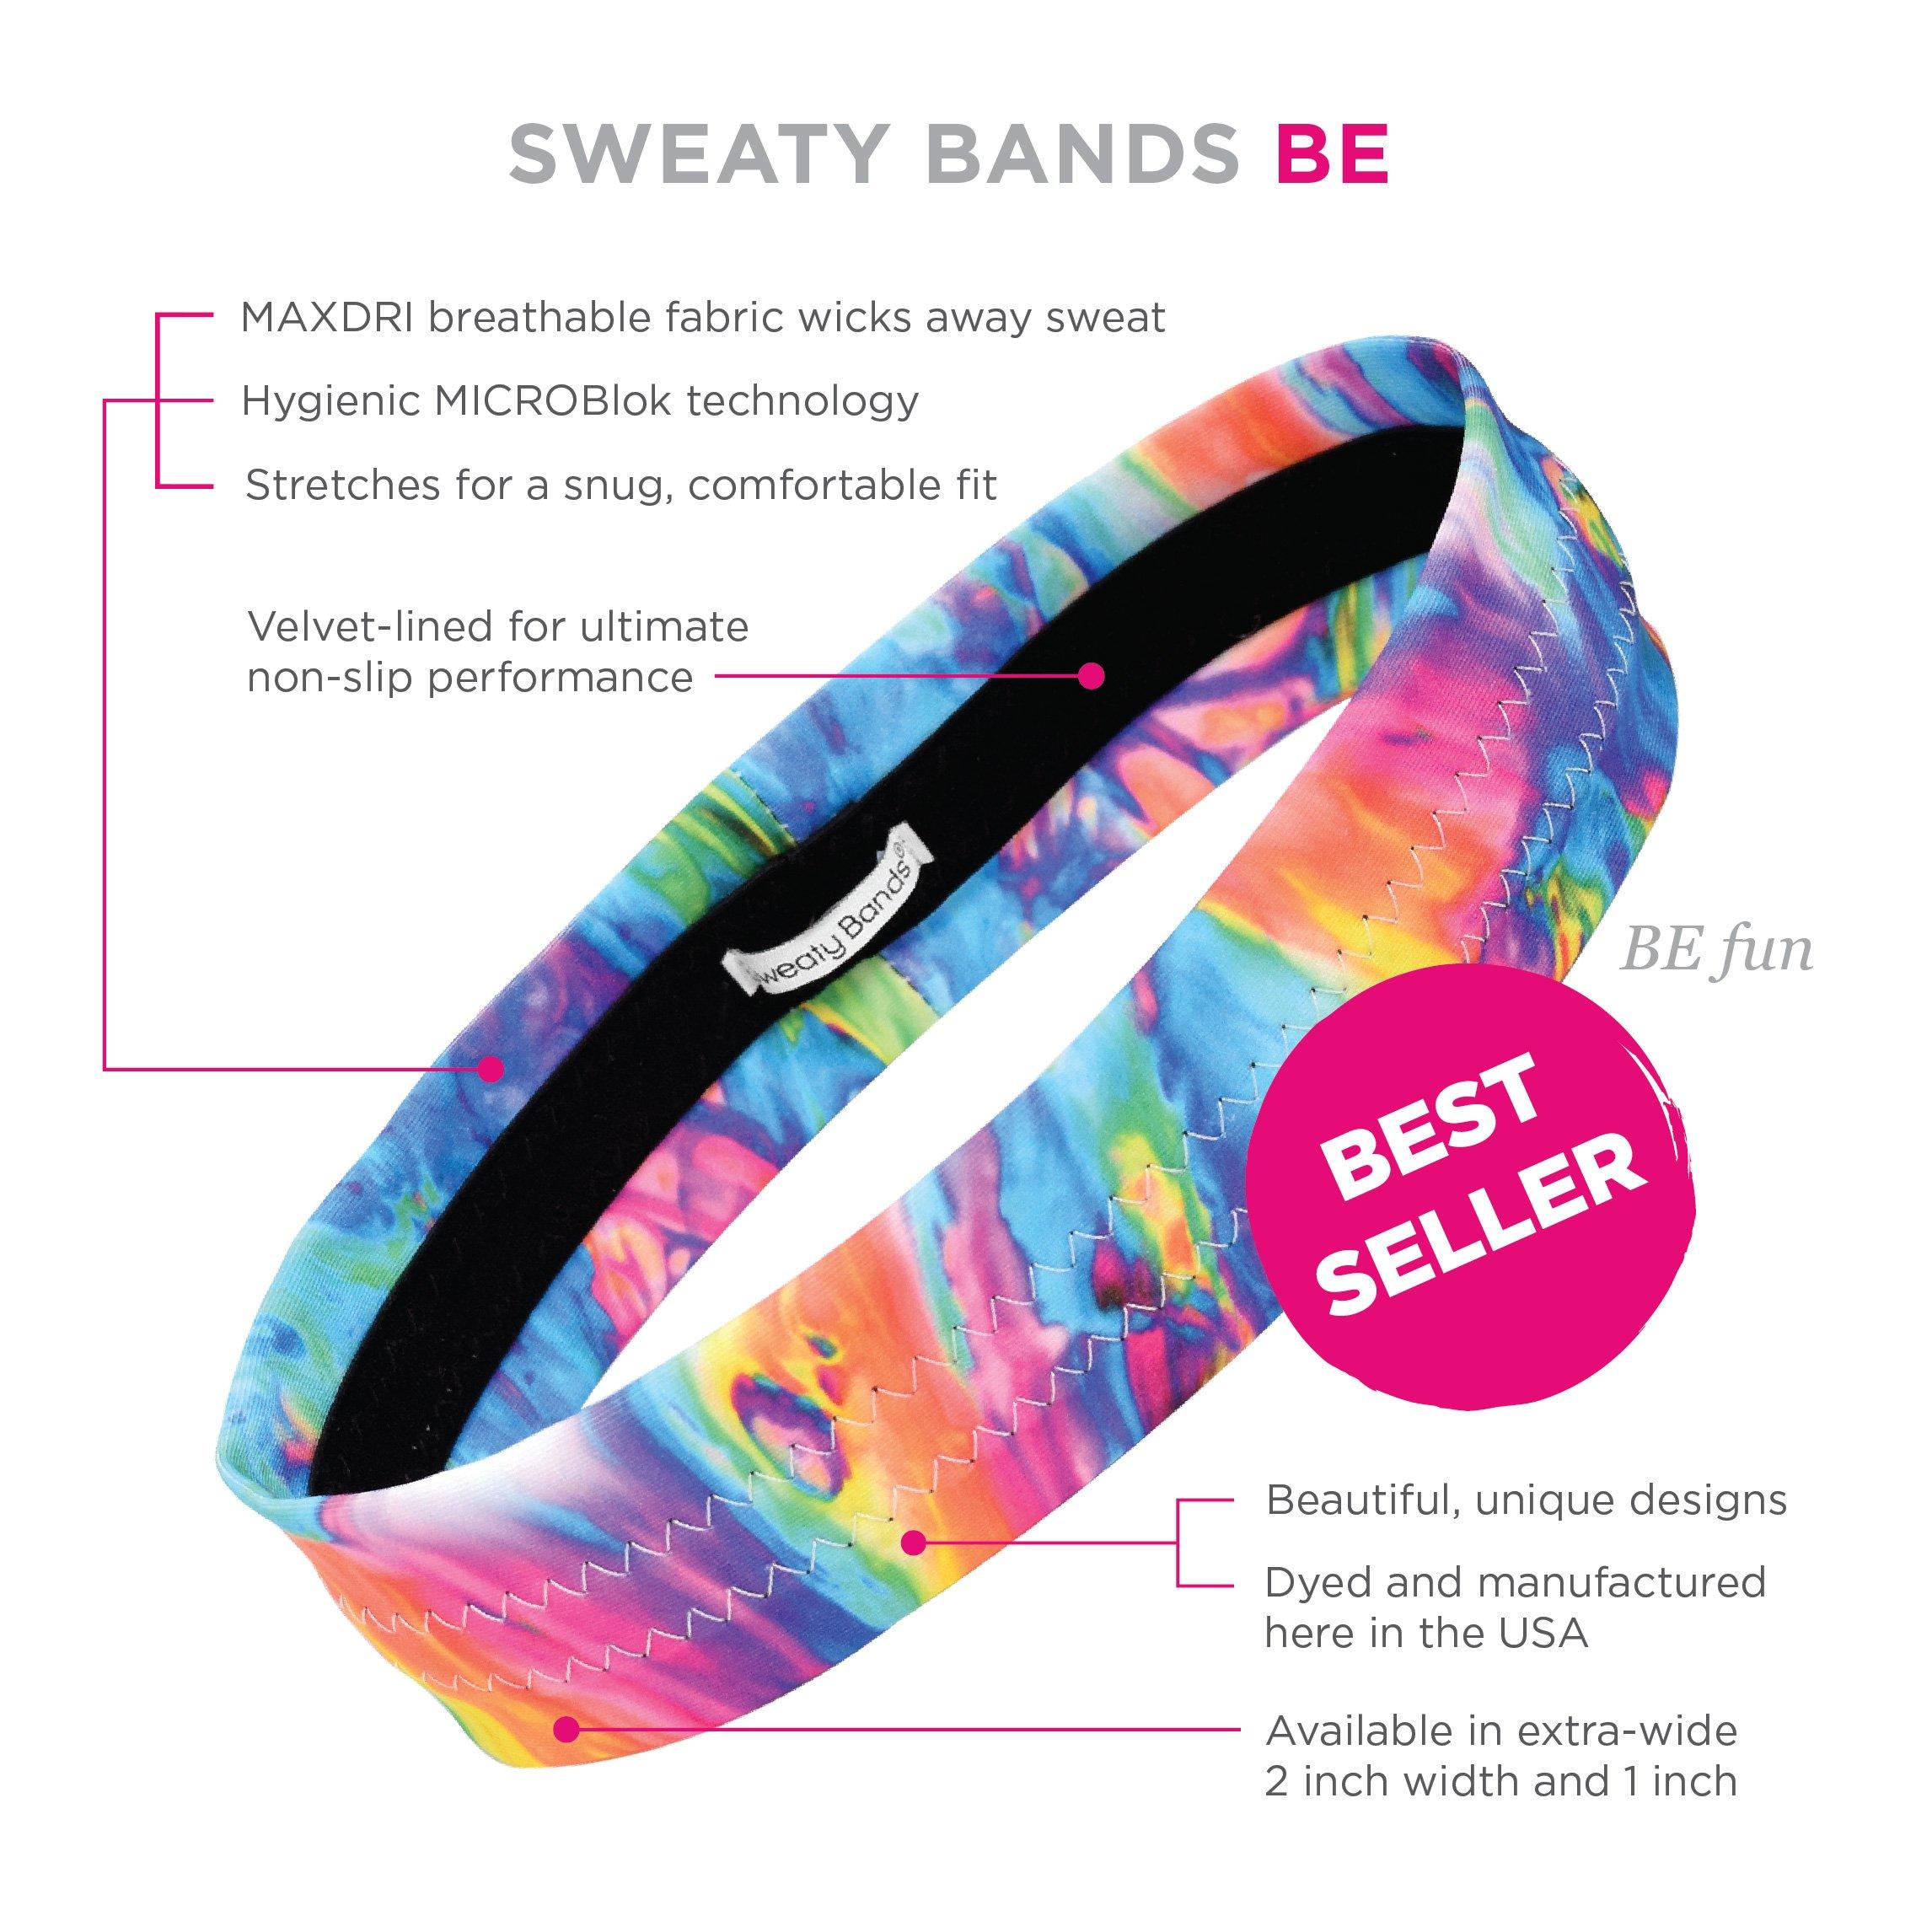 Sweaty Bands Womens Girls Headband - Non-Slip Velvet-Lined Sport Hairband - BE Fun Multi 1-Inch by Sweaty Bands (Image #5)